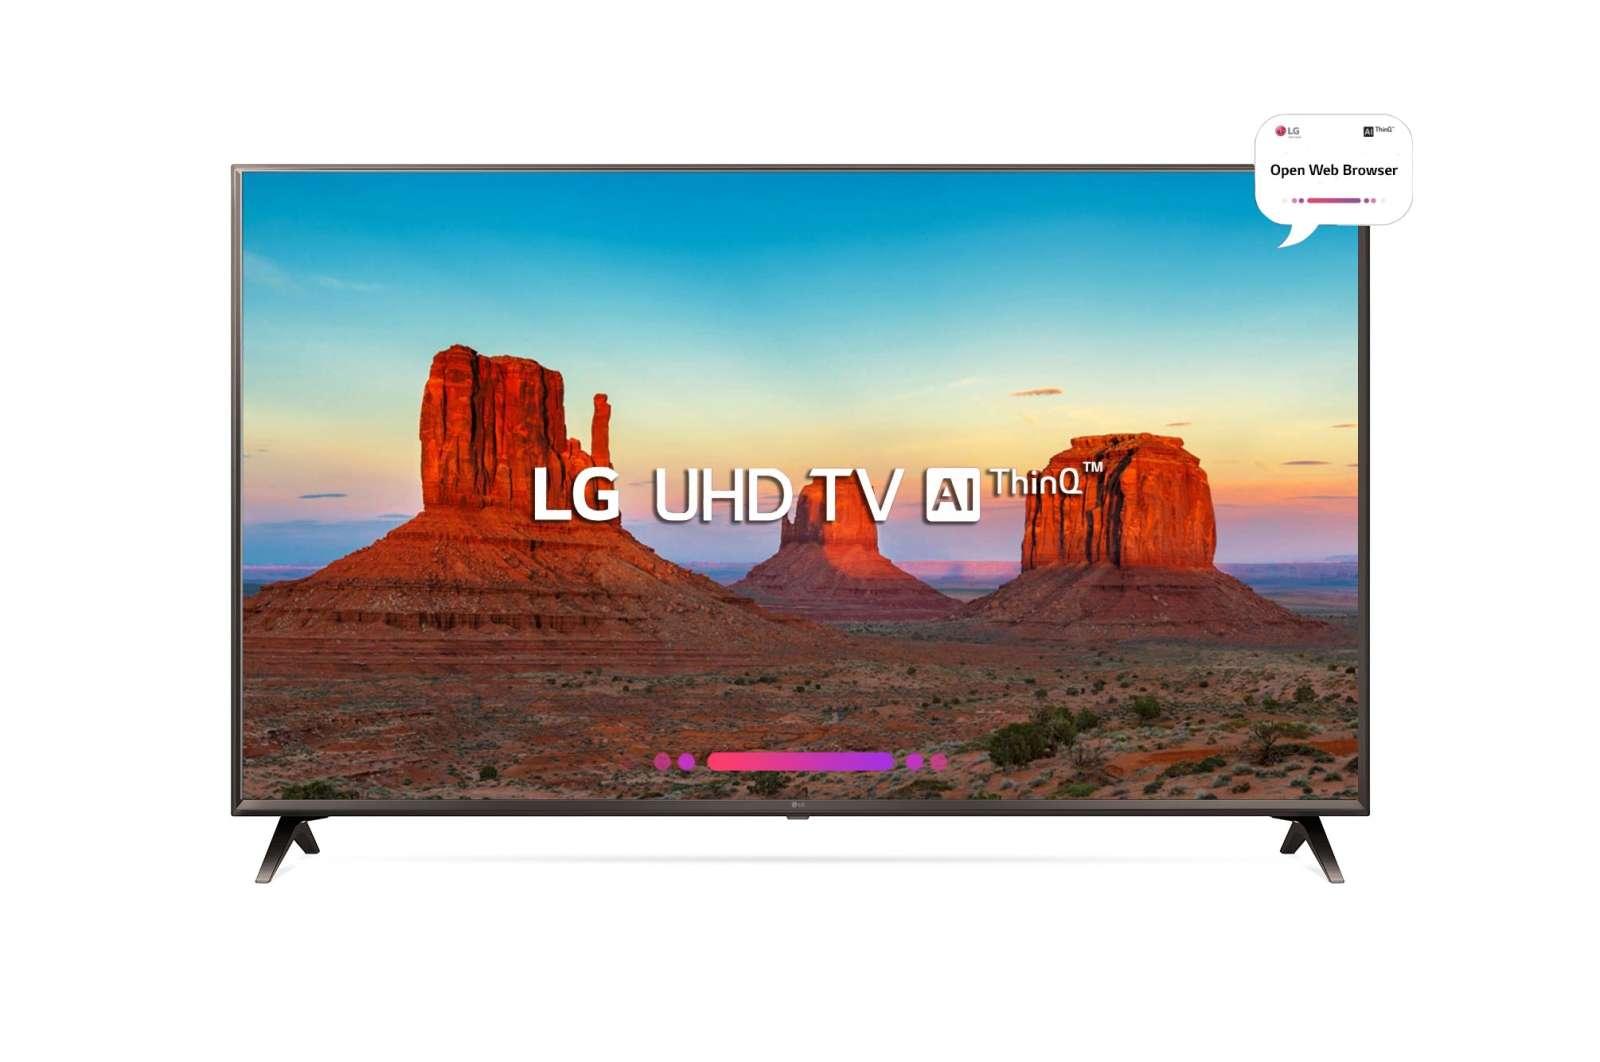 LG 50 Inches Ultra HD (4K) LED Smart TV (50UK6560PTC, Black)